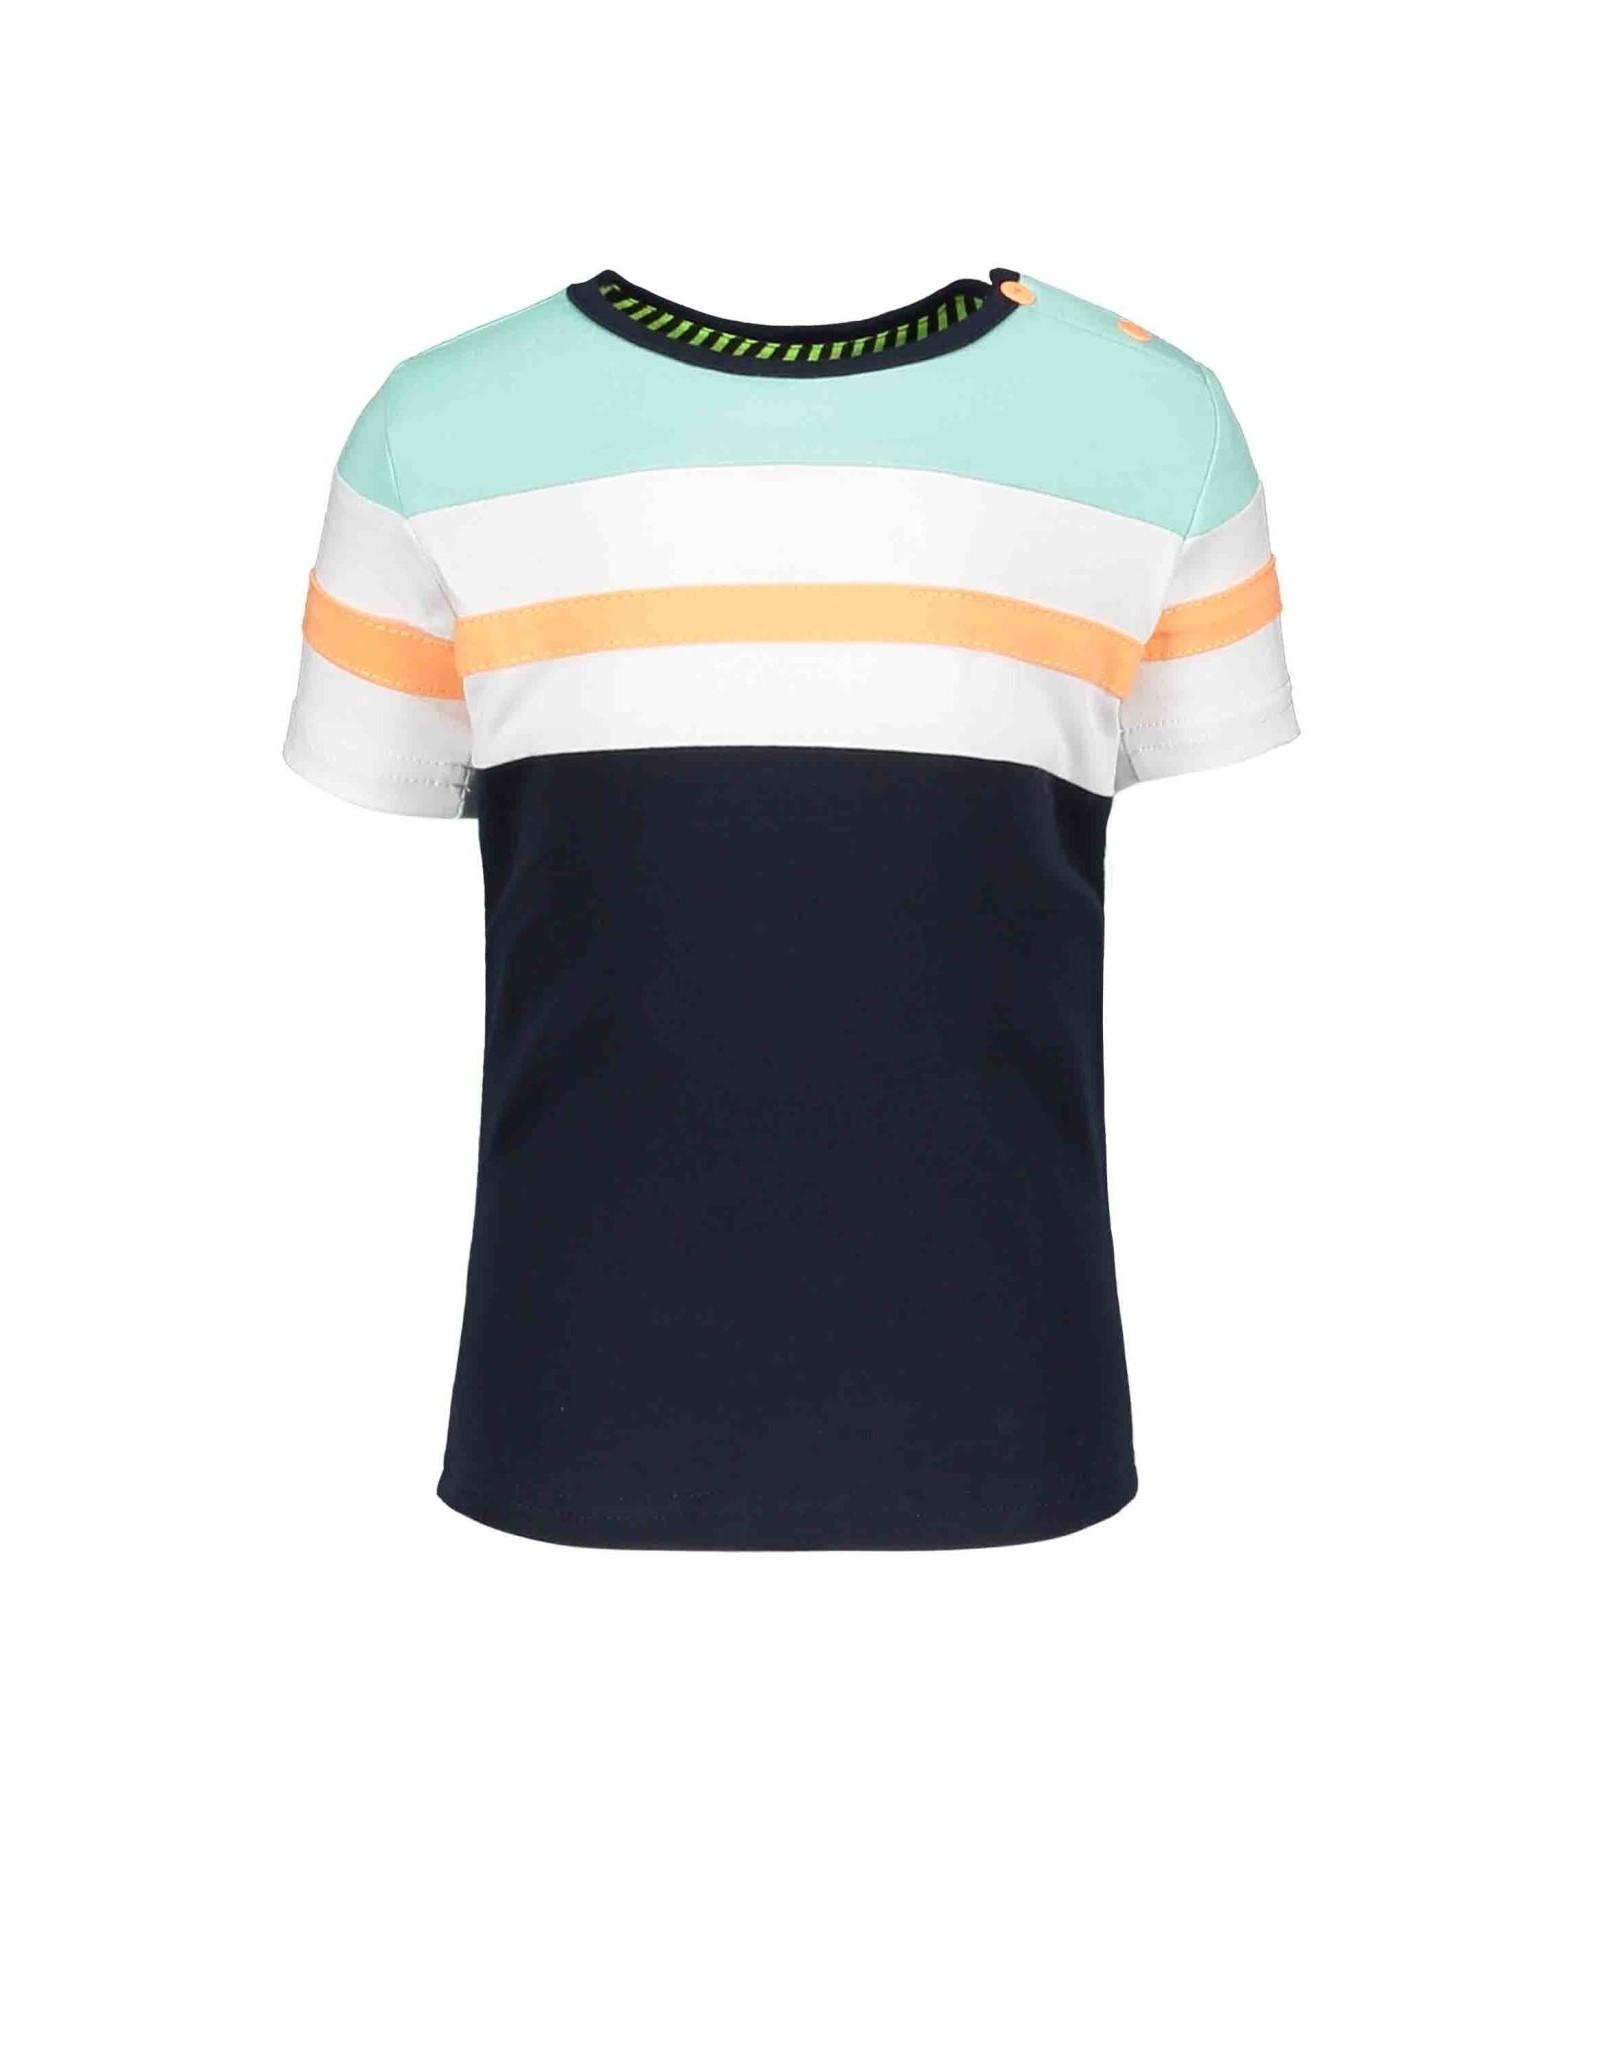 B.Nosy B.Nosy baby jongens t-shirt Color Block Oxford Blue